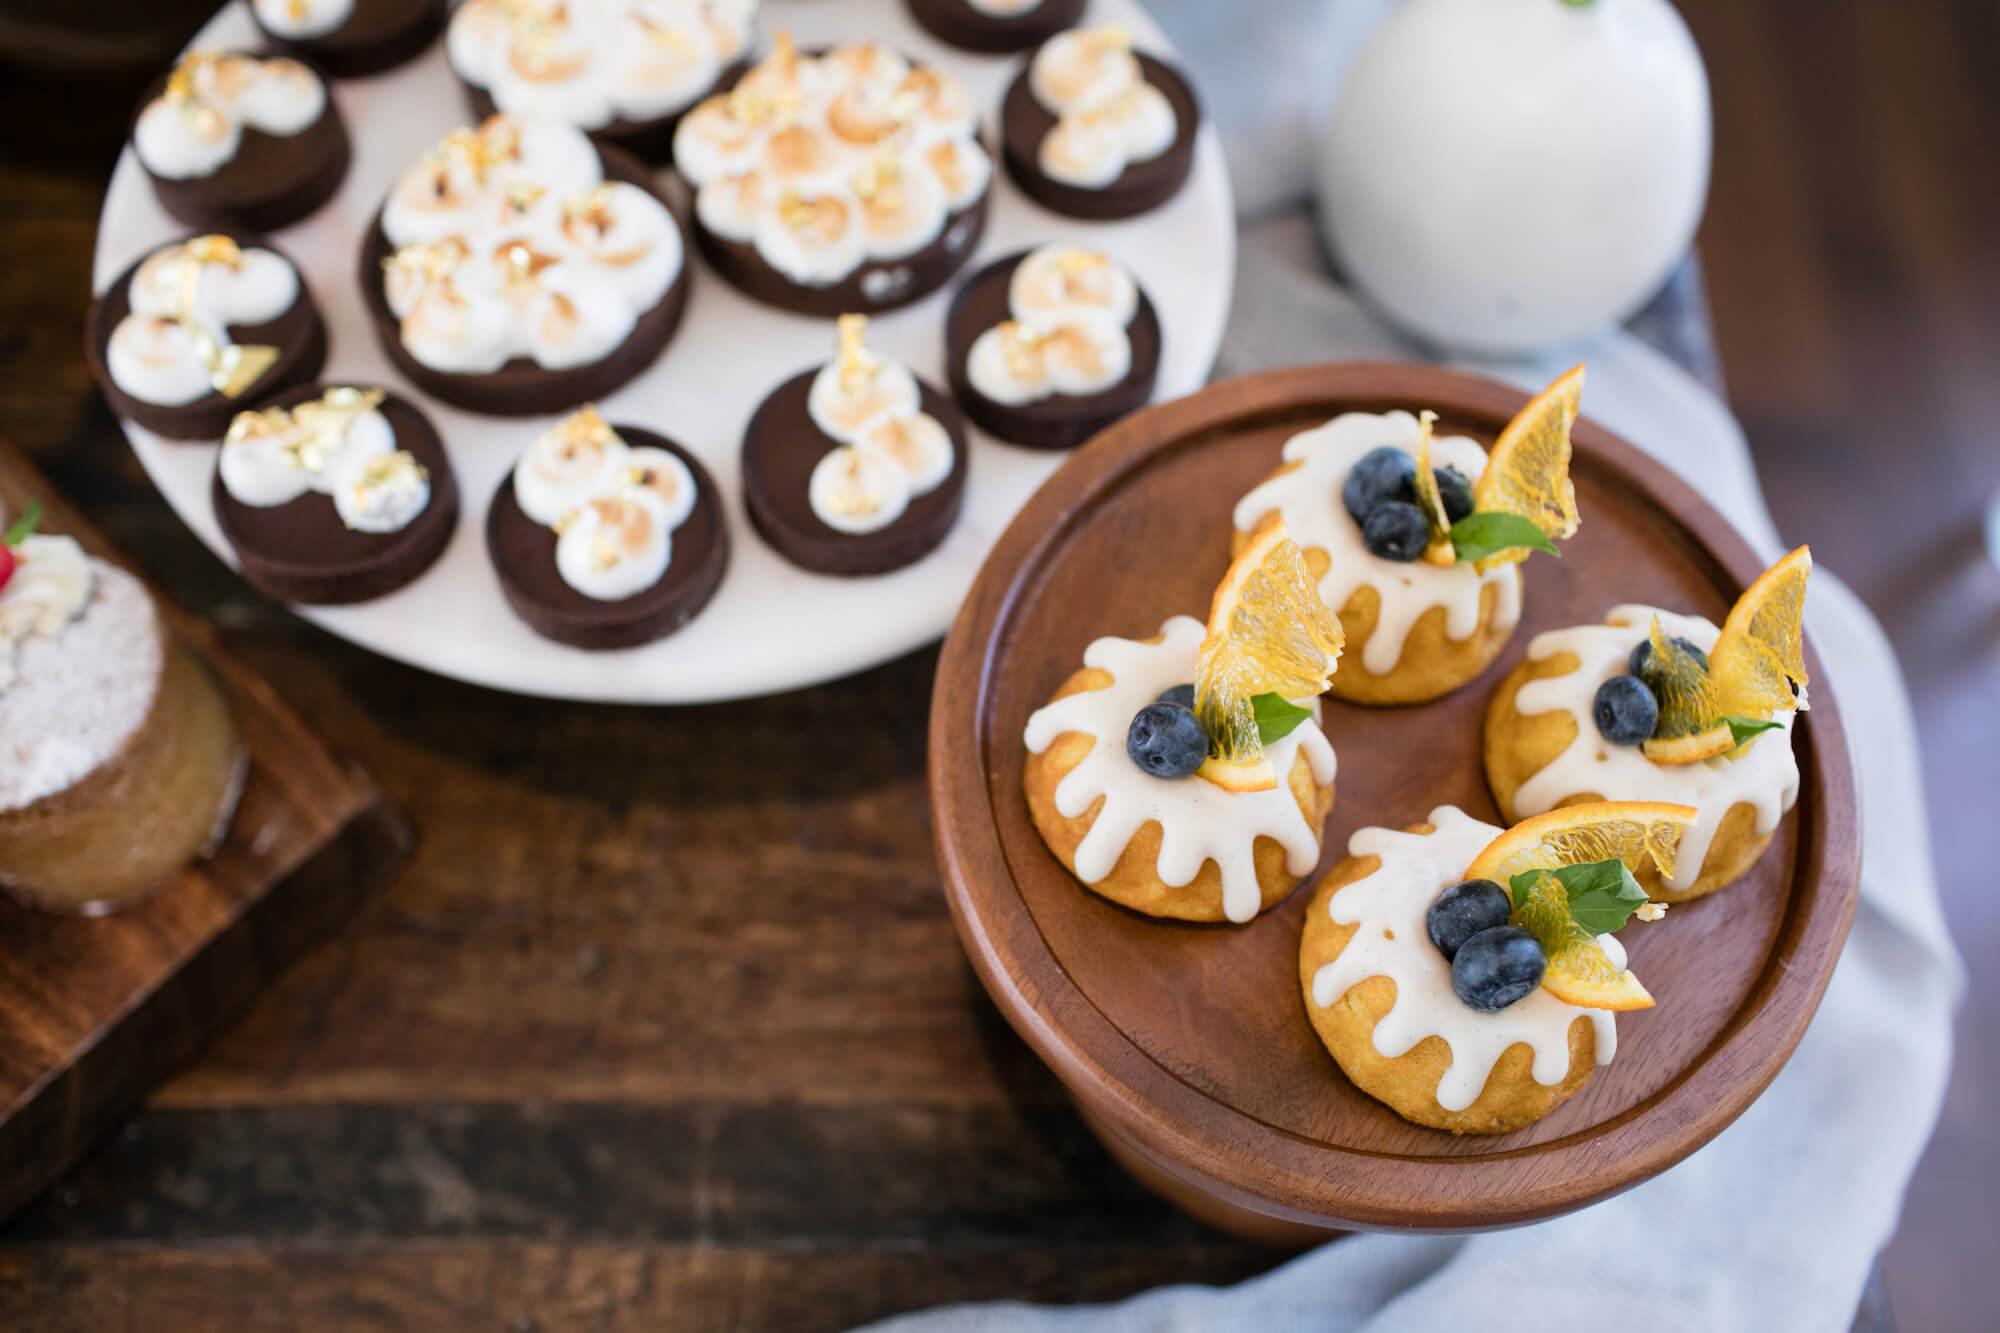 TSG_Events_Dessert_Affair_0010 copy 2.jpg